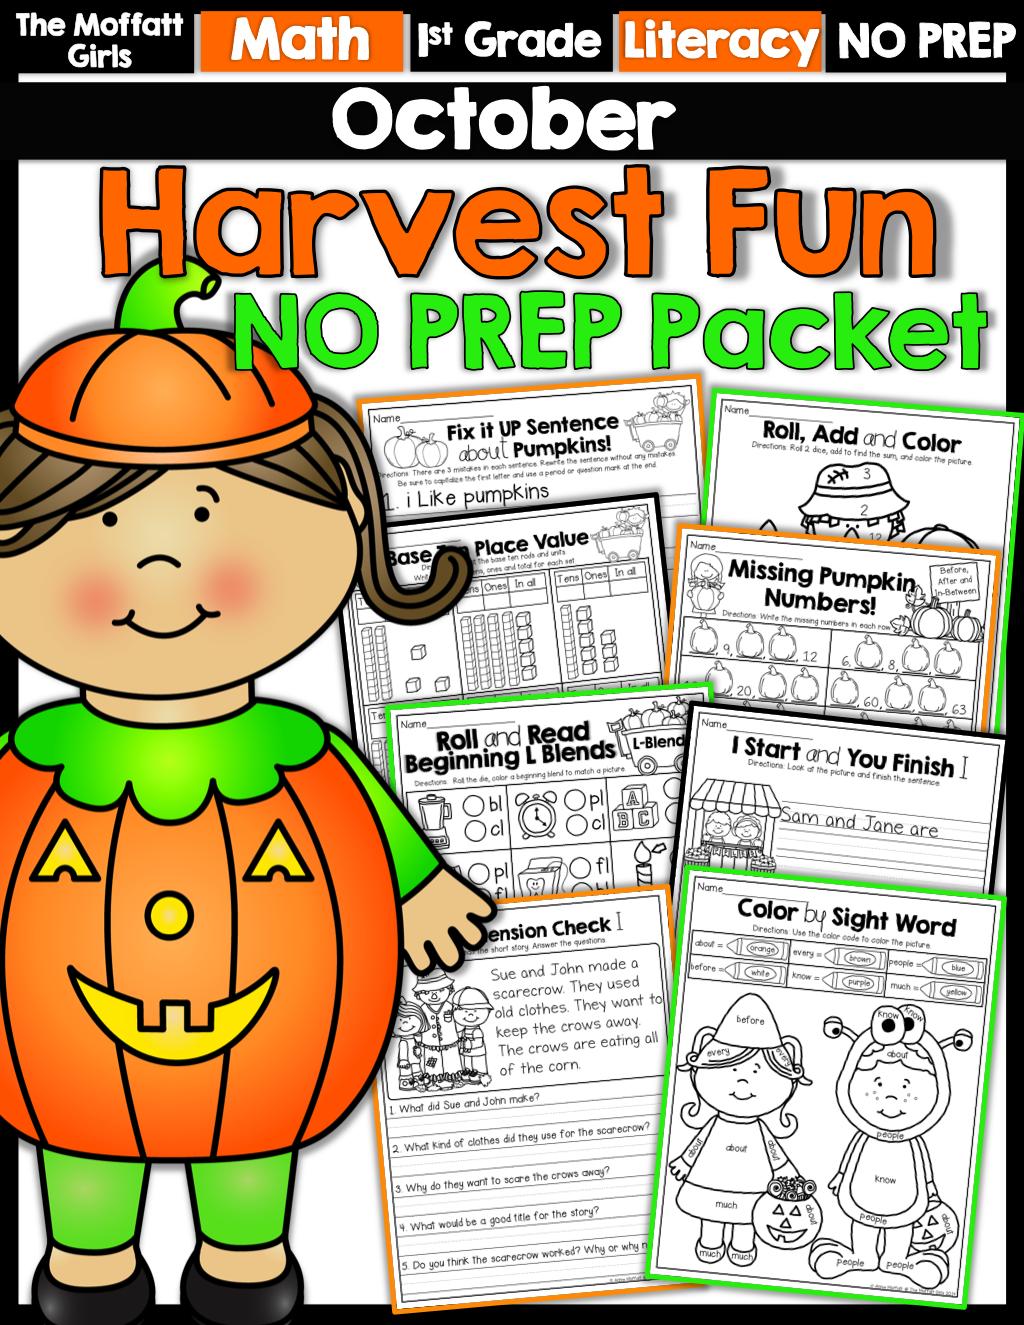 October No Prep Math And Literacy Packet 1st Grade